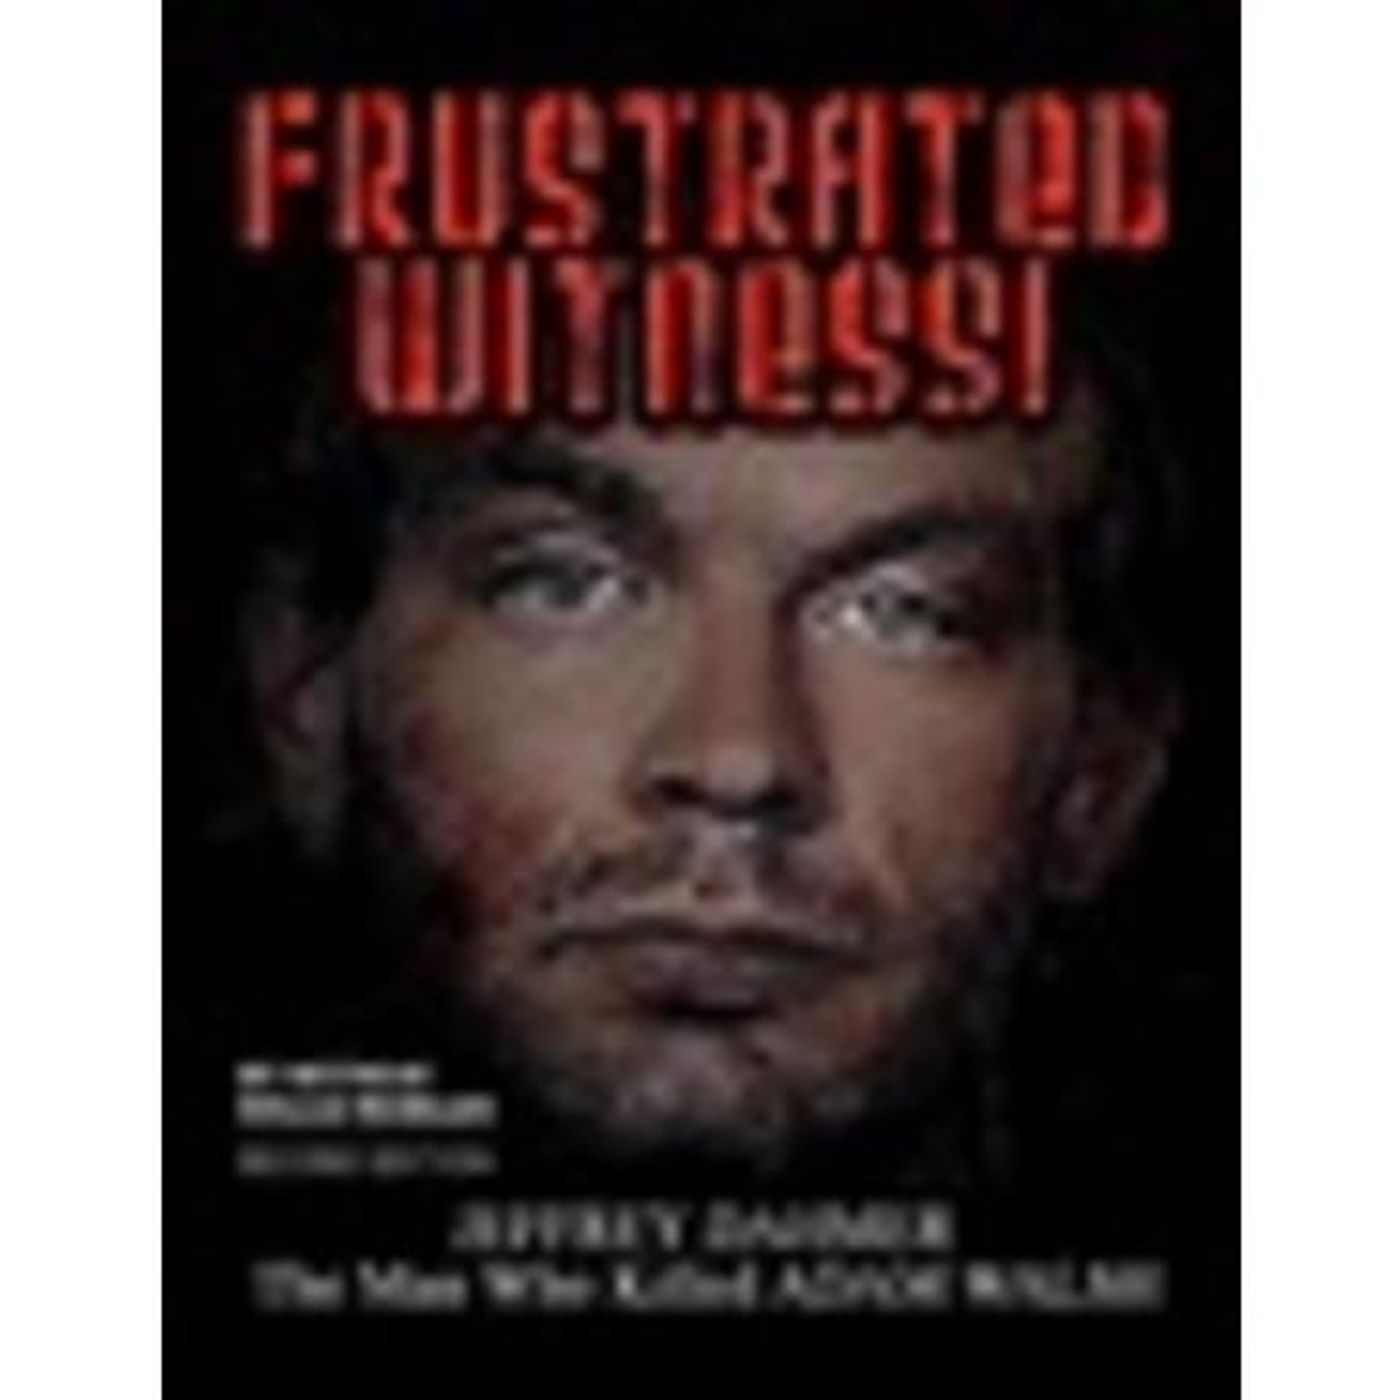 FRUSTRATED WITNESS-Willis Morgan